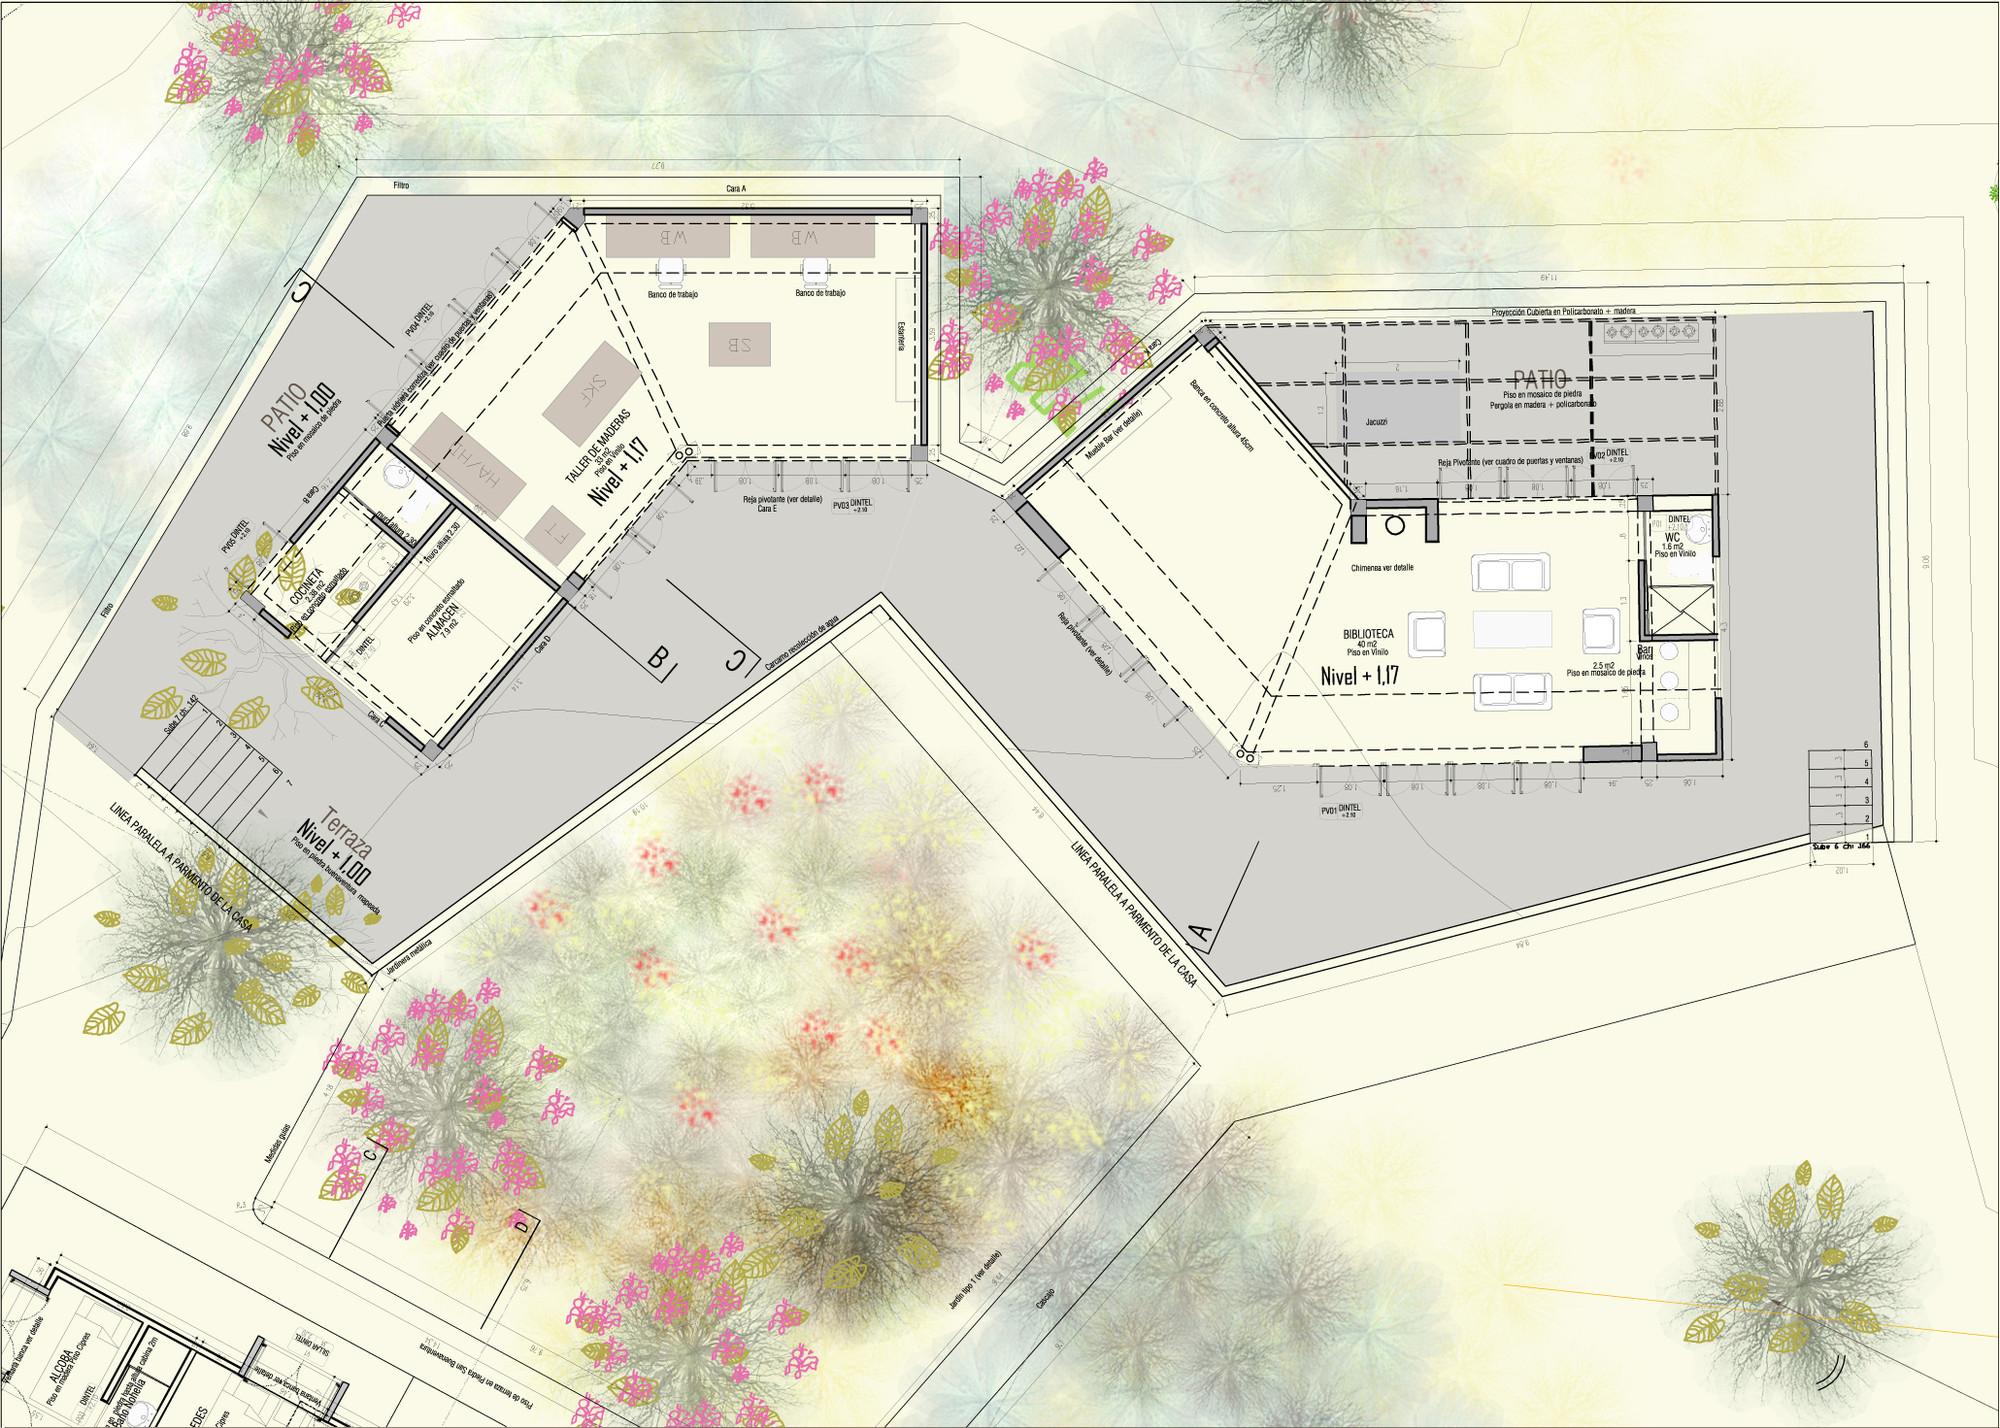 Cadaluja reforma de una casa campesina ctrl g for Plataforma de arquitectura